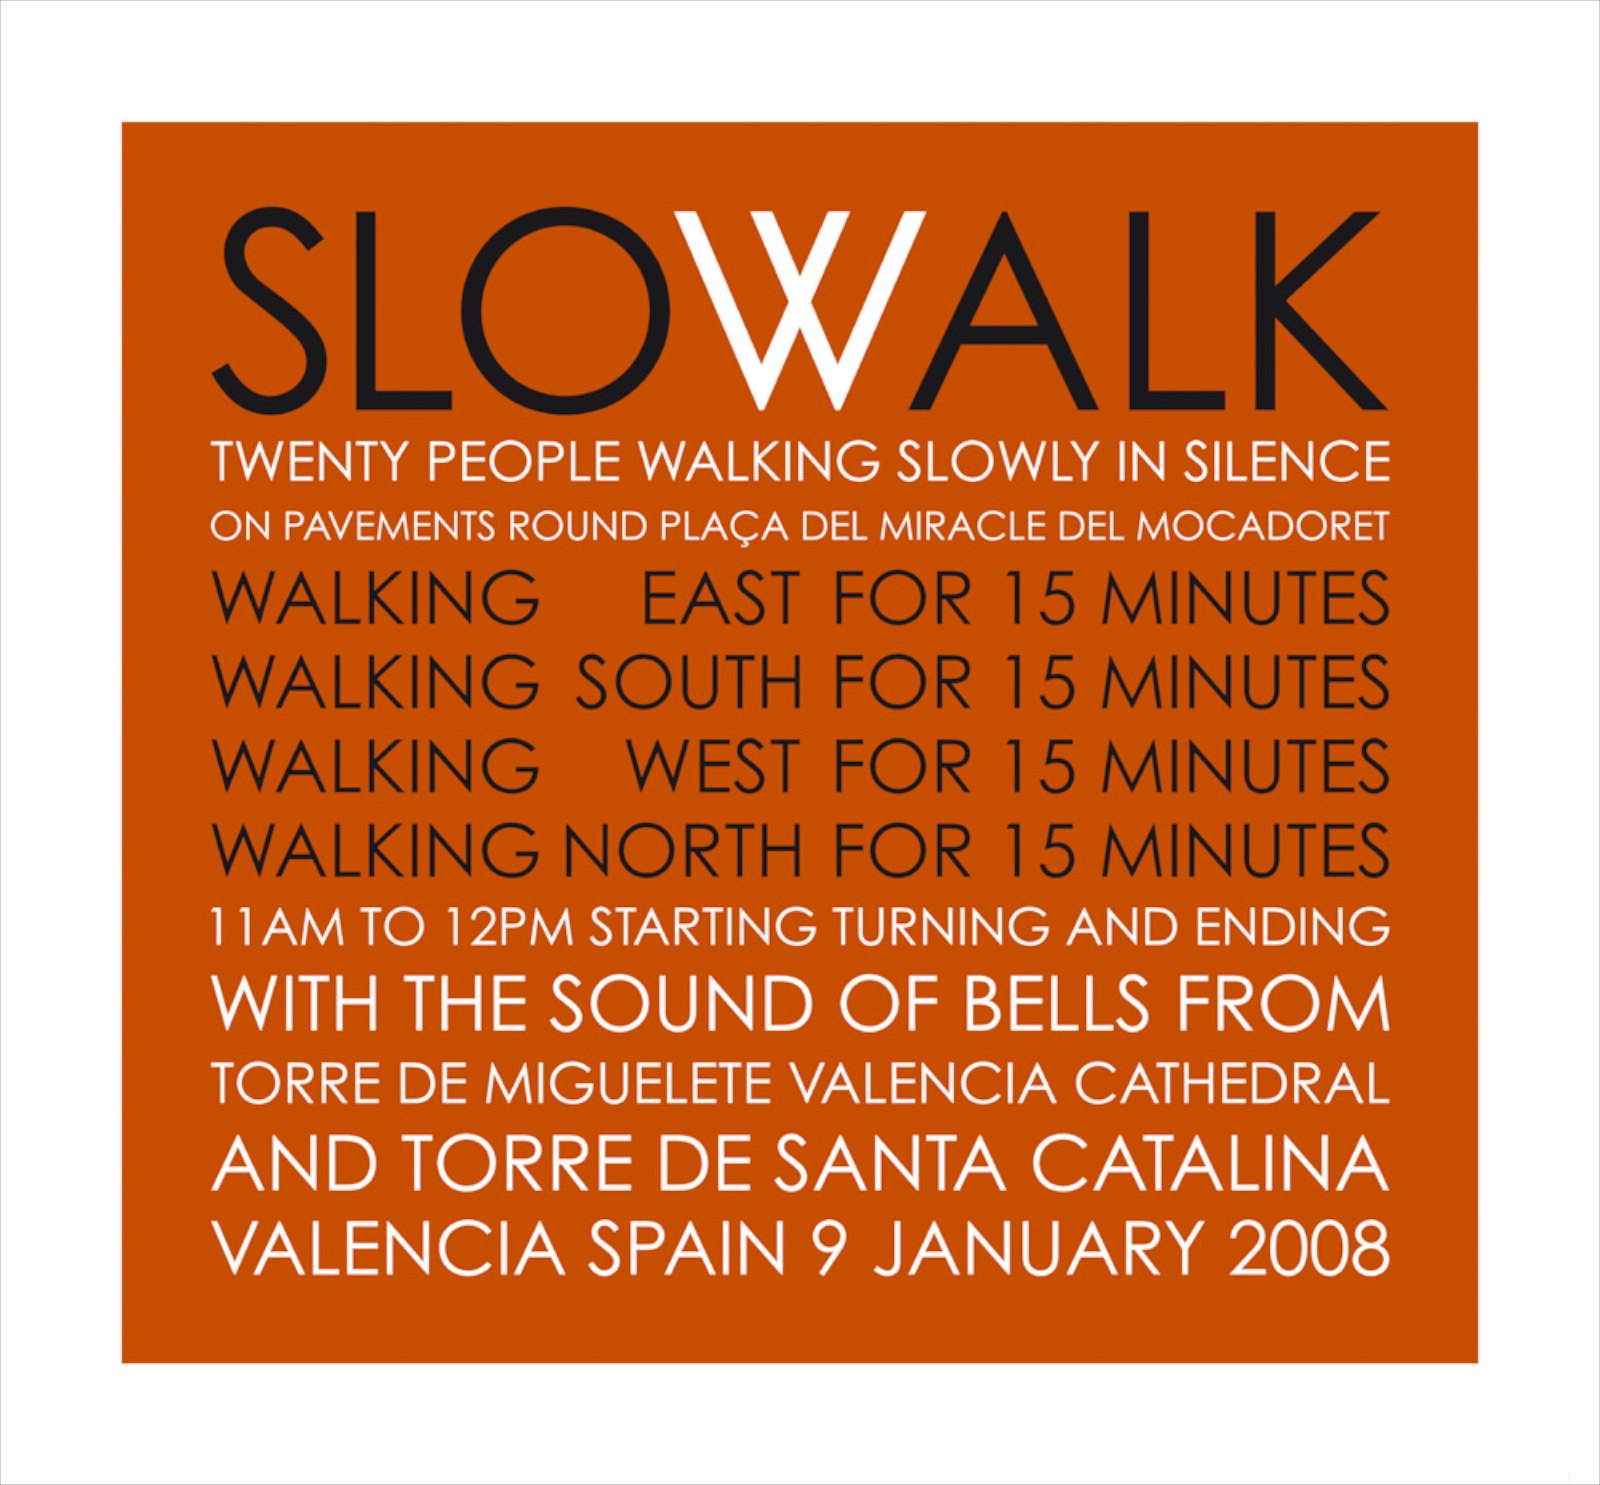 Slowalk, Valencia Spain, 2008 ,Giclée print, 61 x 65,5 cm